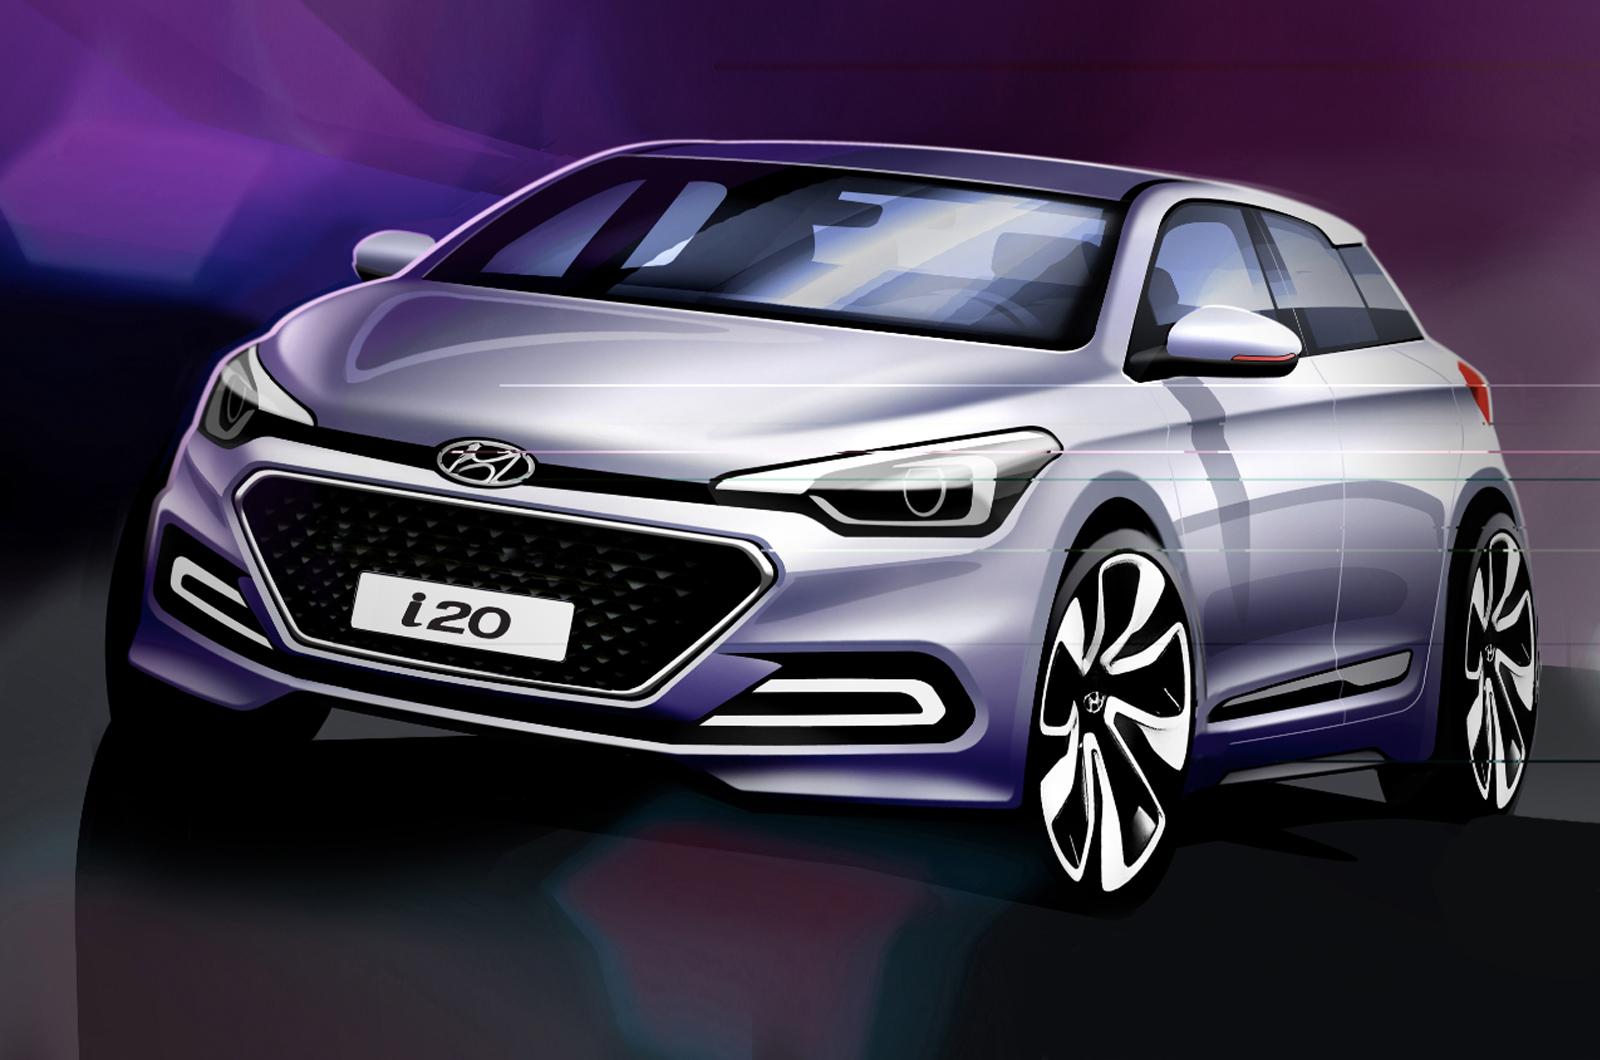 new hyundai i20 revealed in design sketches autocar. Black Bedroom Furniture Sets. Home Design Ideas